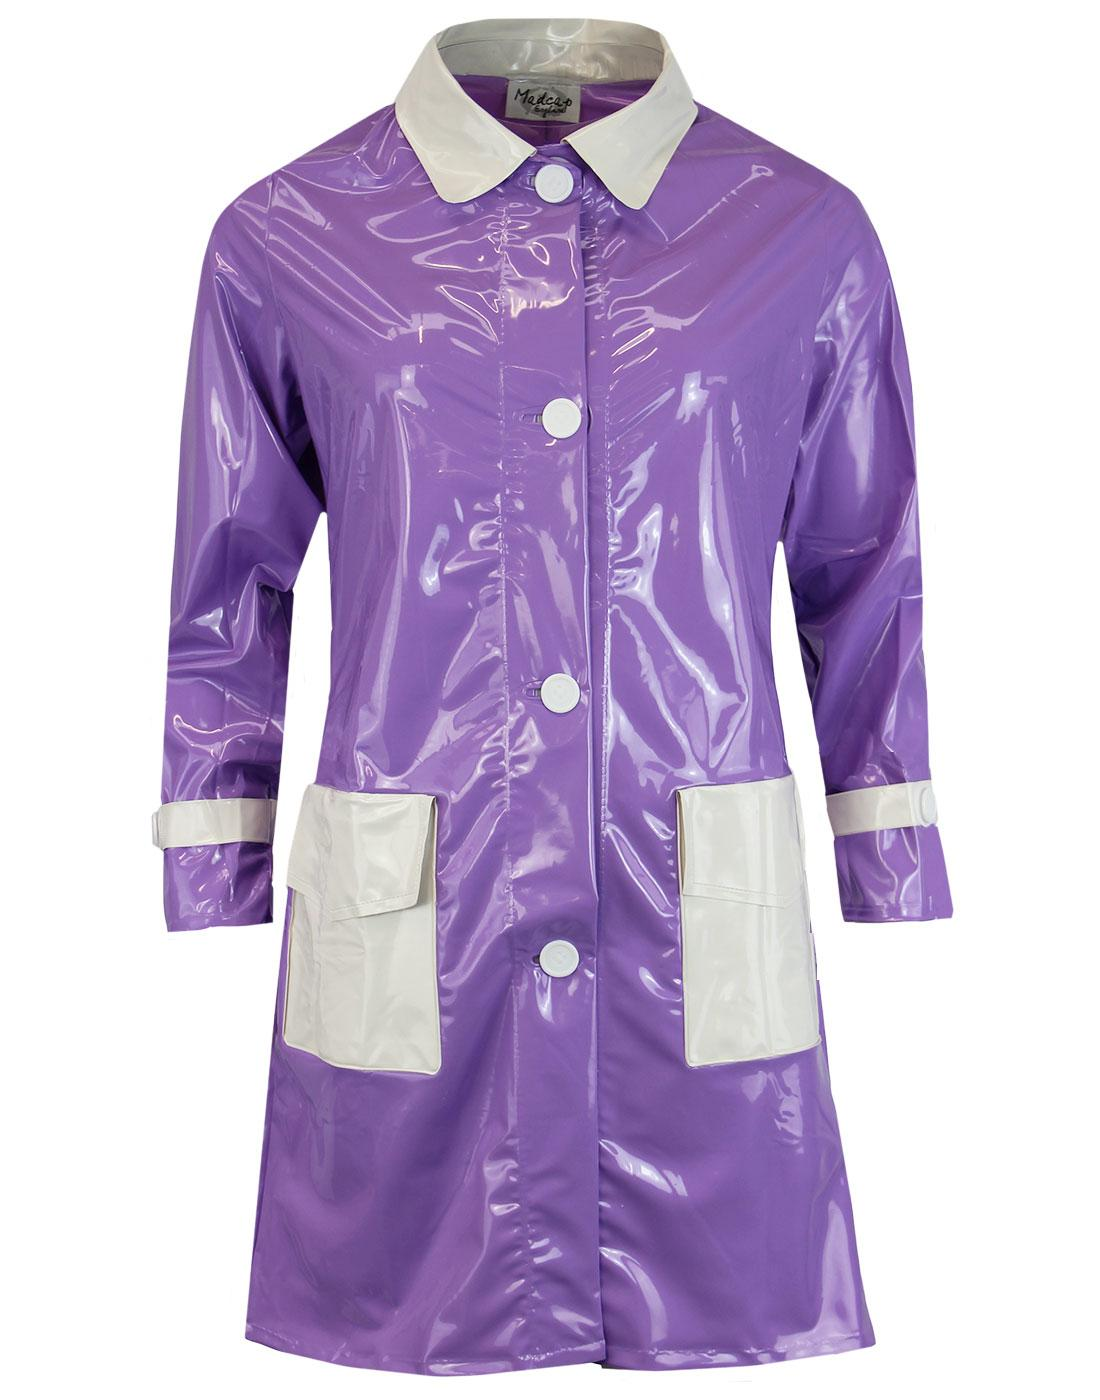 Robin MADCAP ENGLAND Mod 2 Tone PVC Raincoat (V)